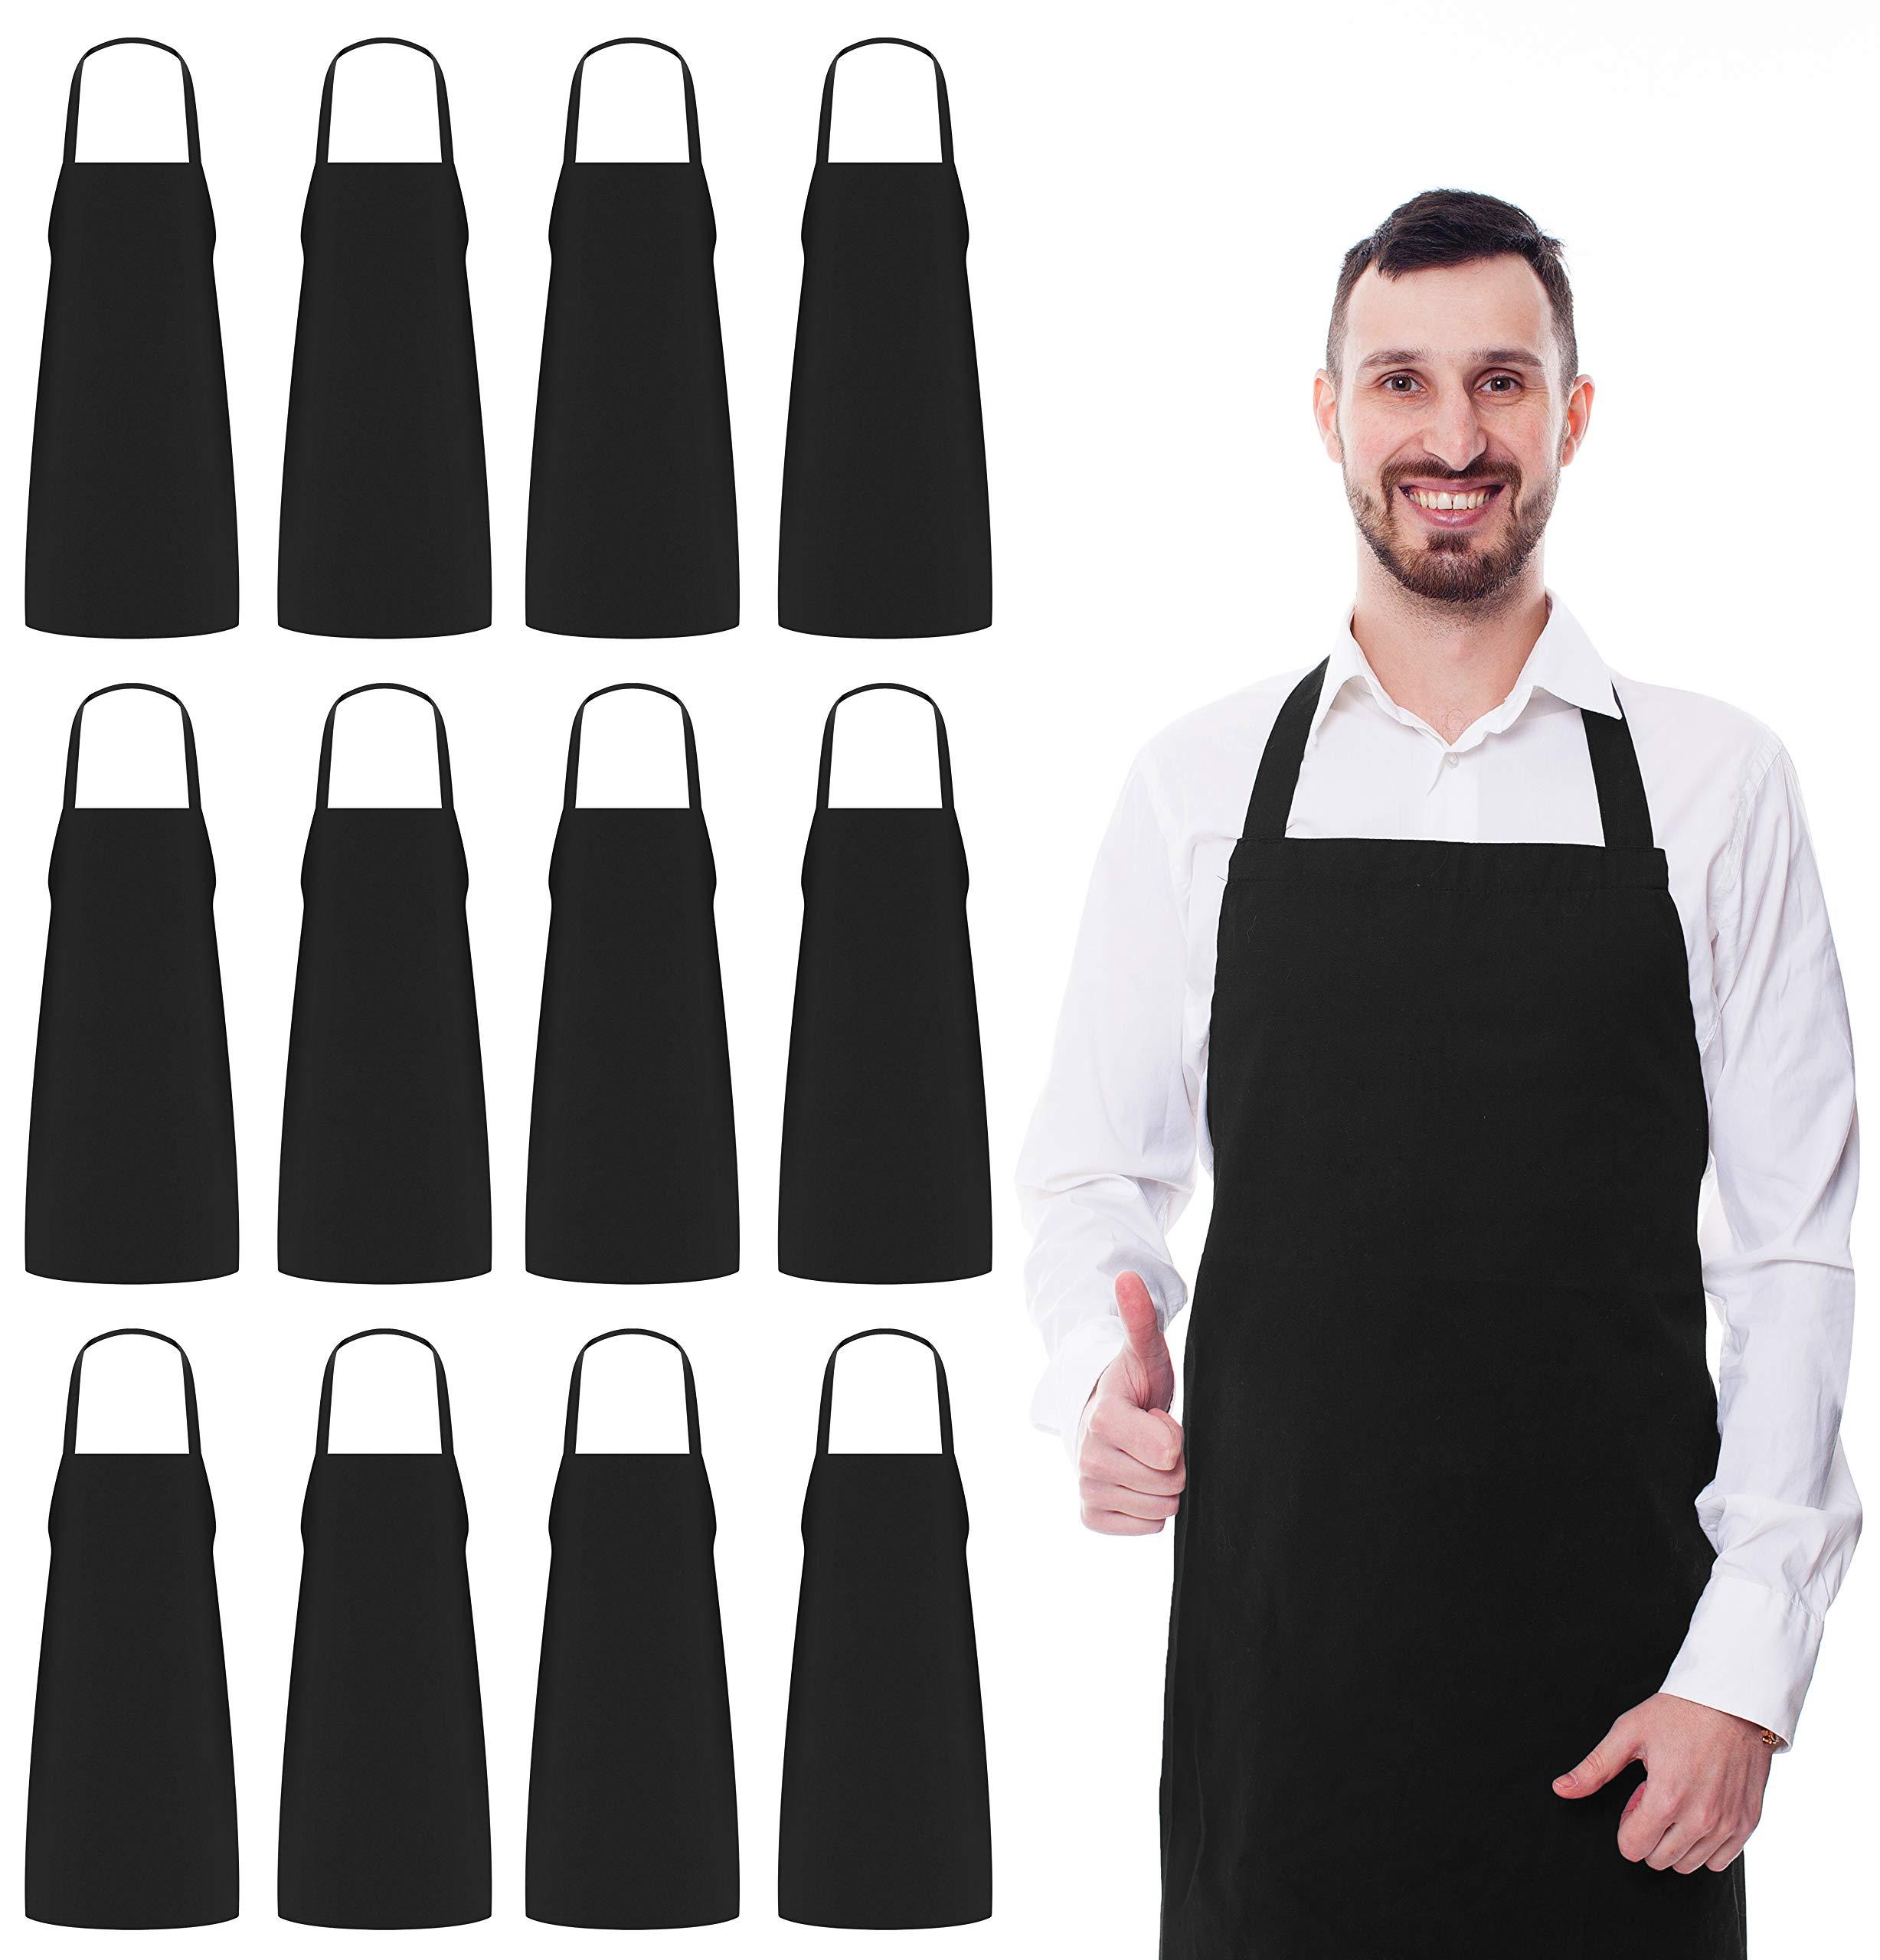 9504378510a Utopia Kitchen 12 Bib Aprons bulk Pack 32 x 28 Inches- Black Aprons product  image